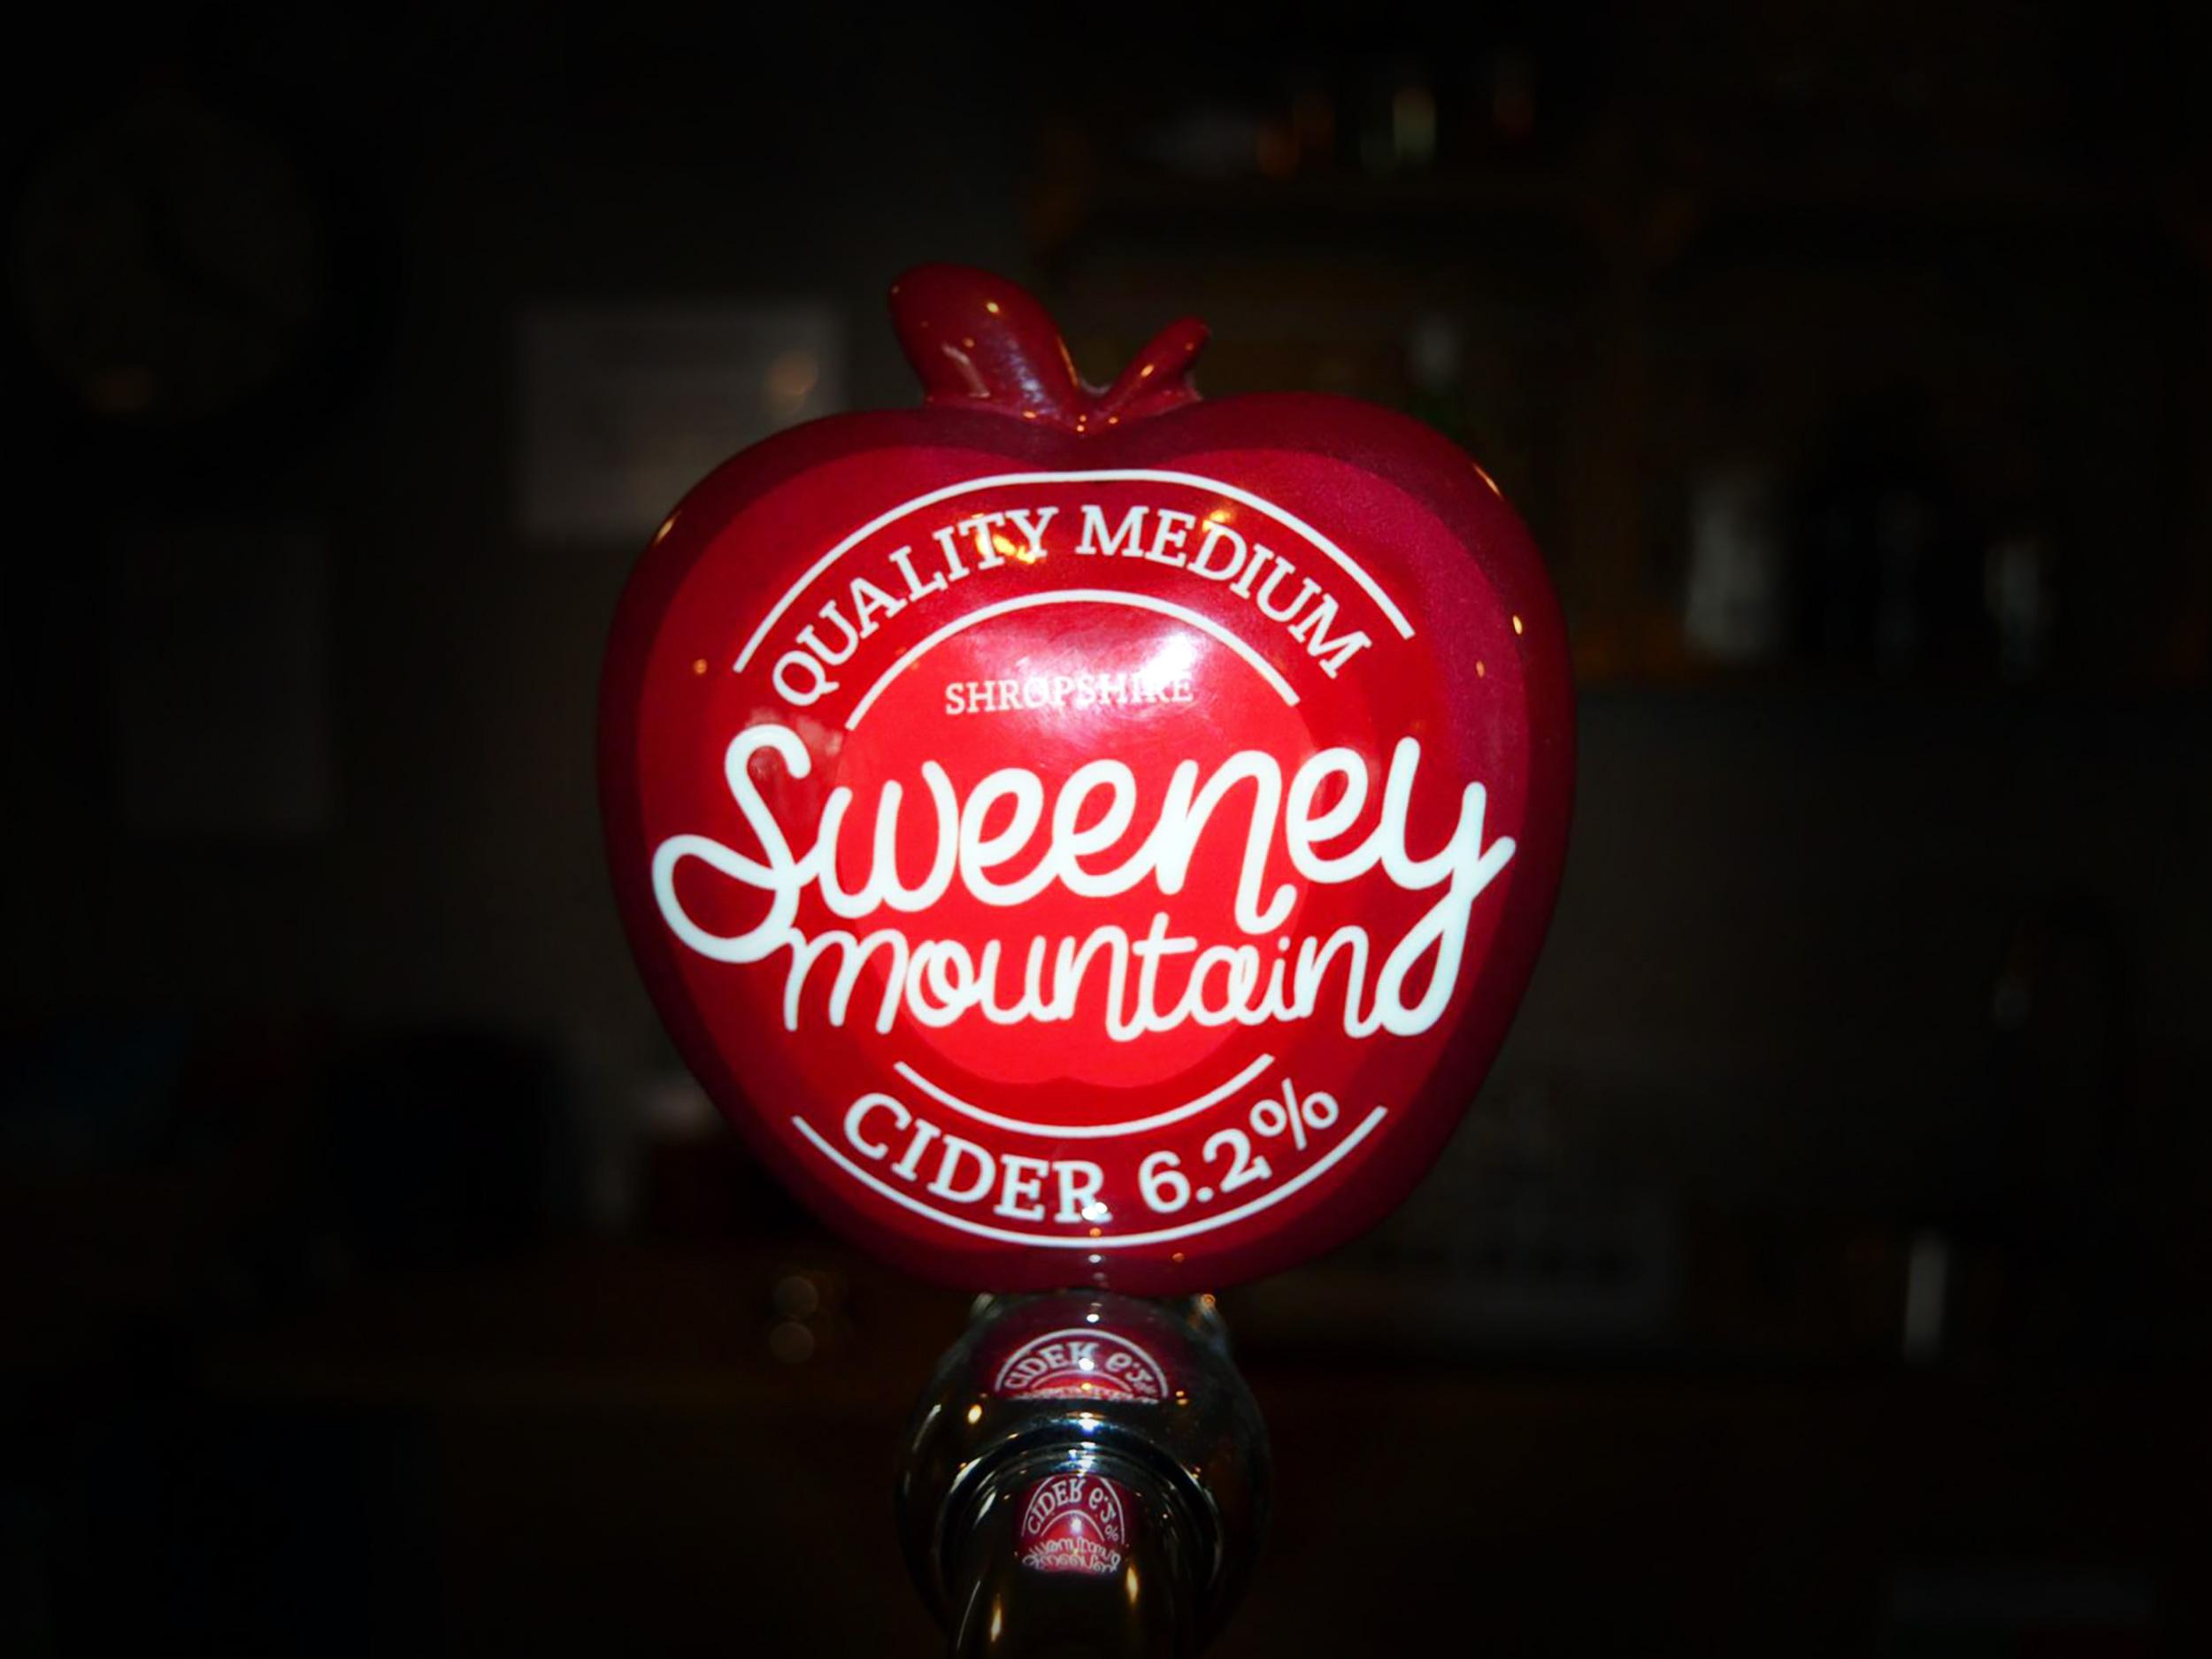 Sweeney Mountain Cider pump clip